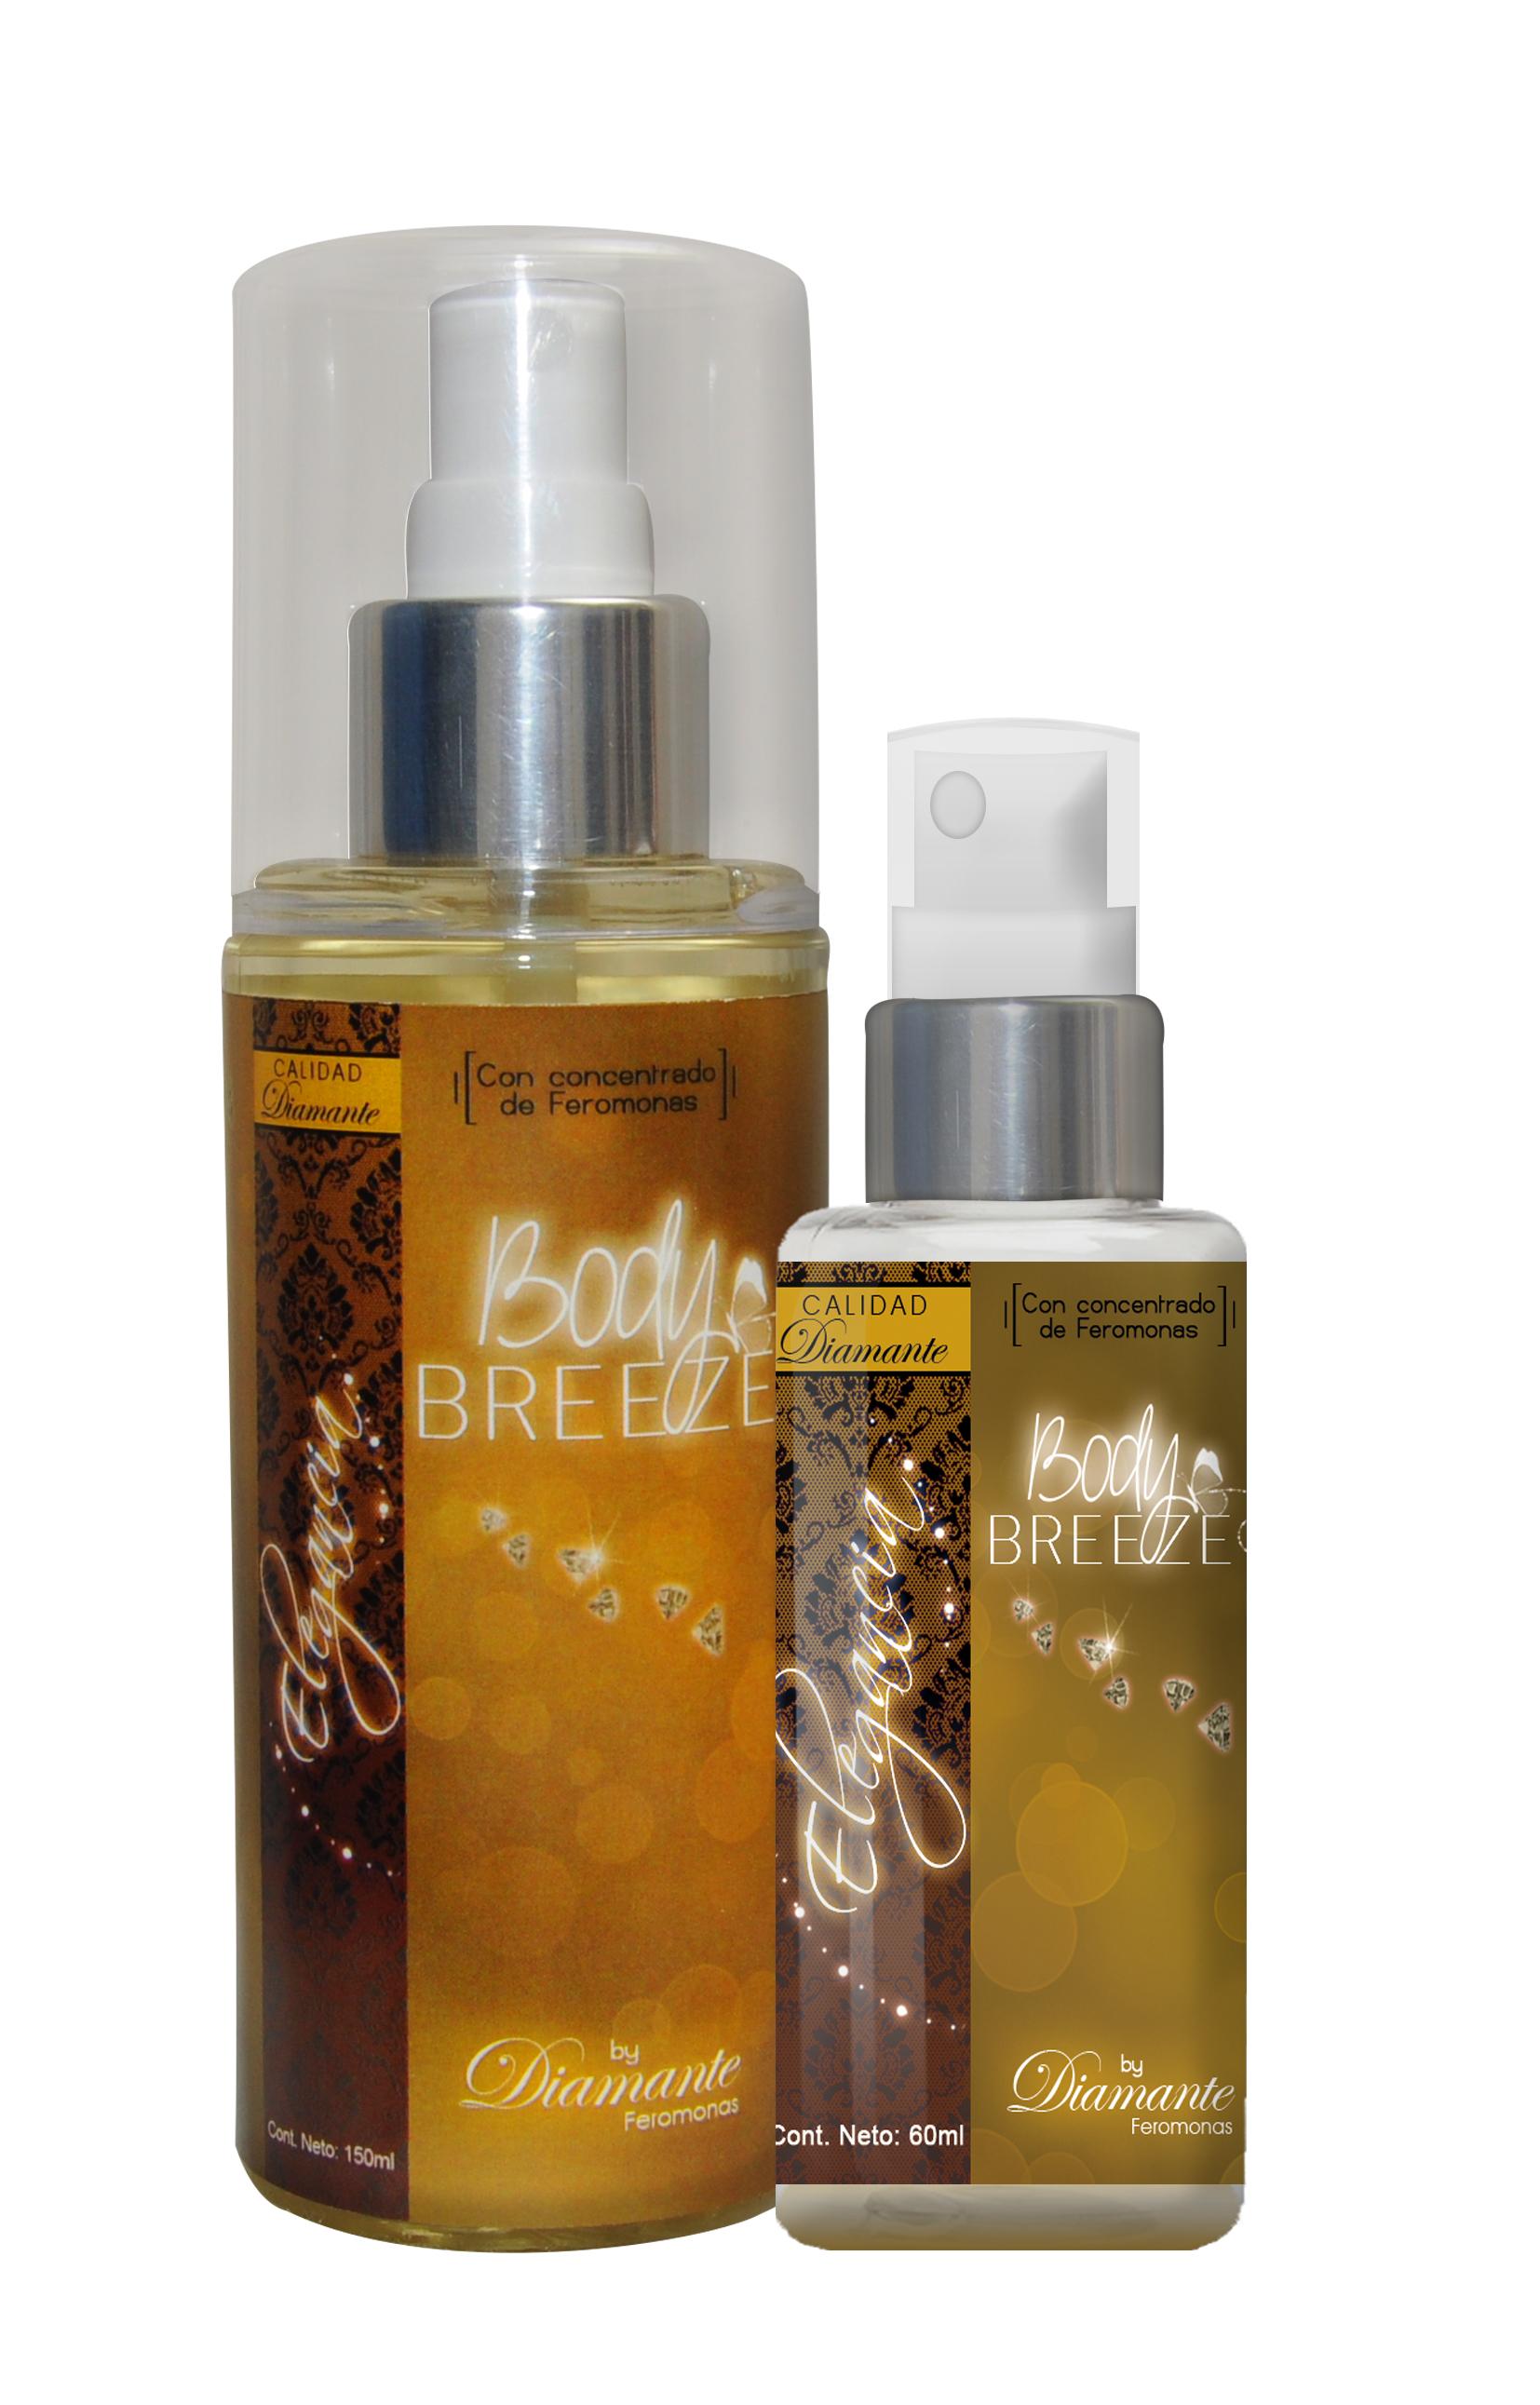 Body Breeze Elegancia